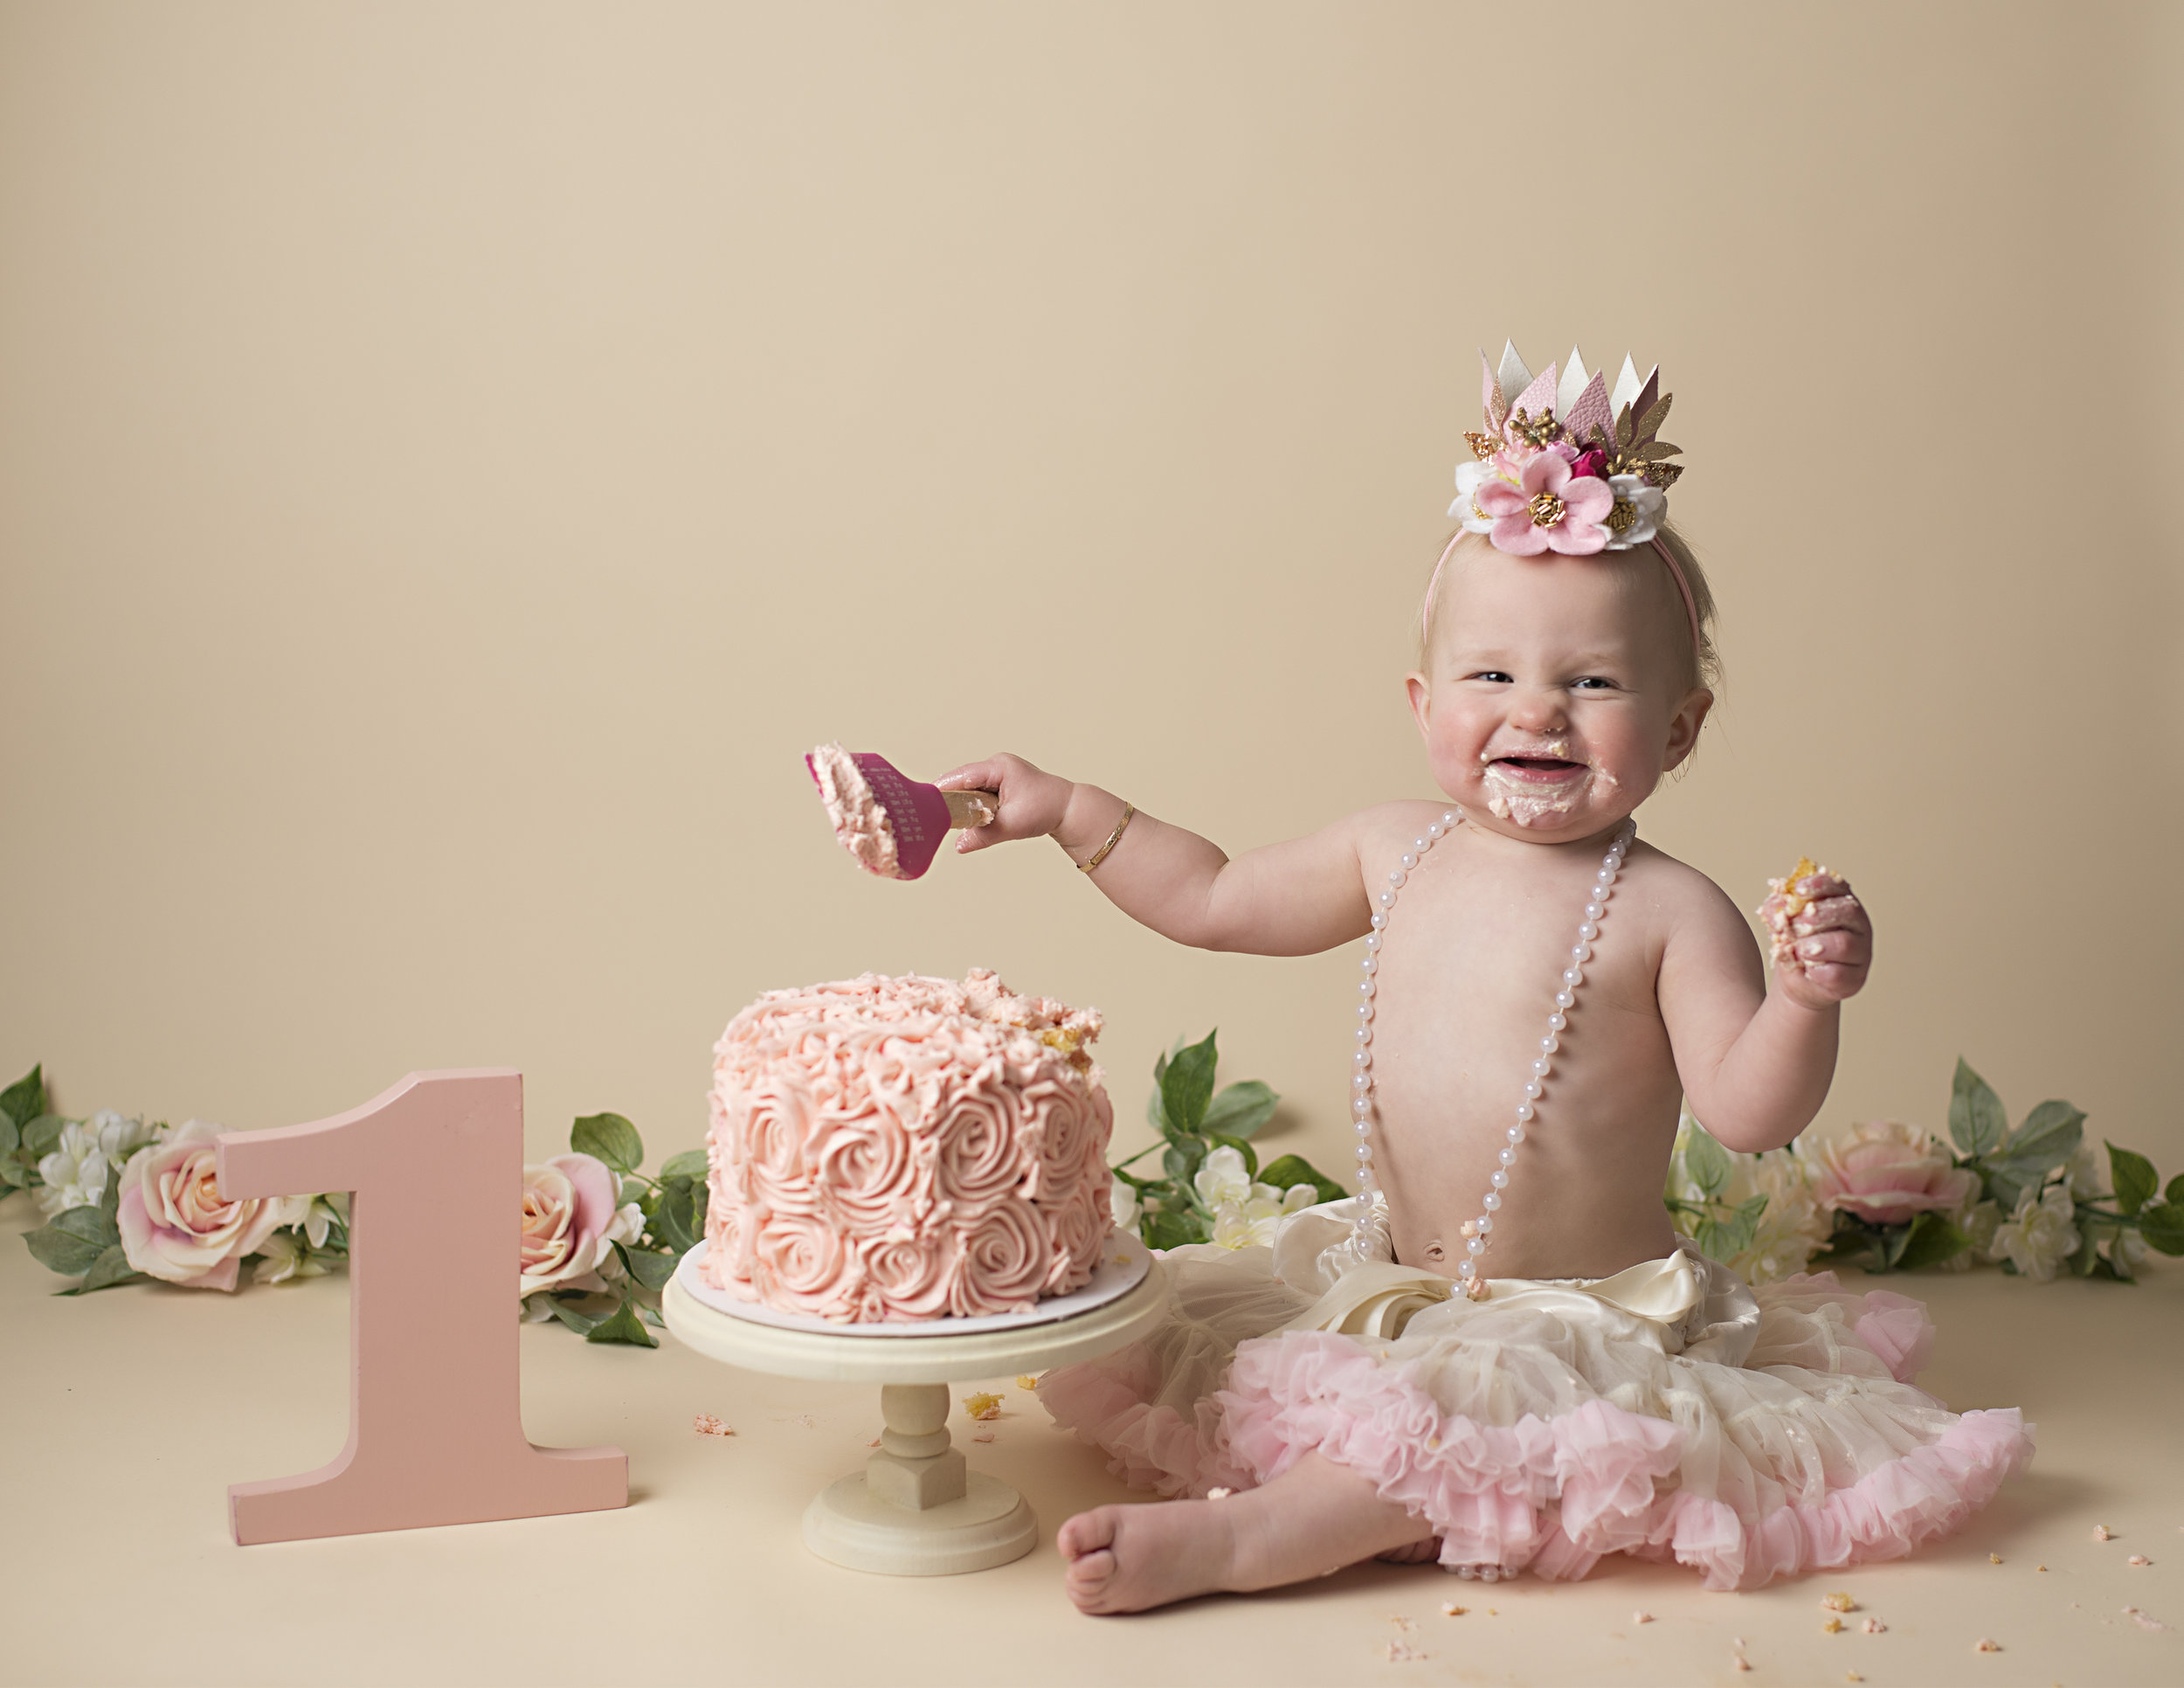 1st Birthday Cake Smash Photography Rosy Posy Photography Newborn Baby Child Cake Smash Family Photographer Leicester Nottingham Derby Birmingham Shepshed